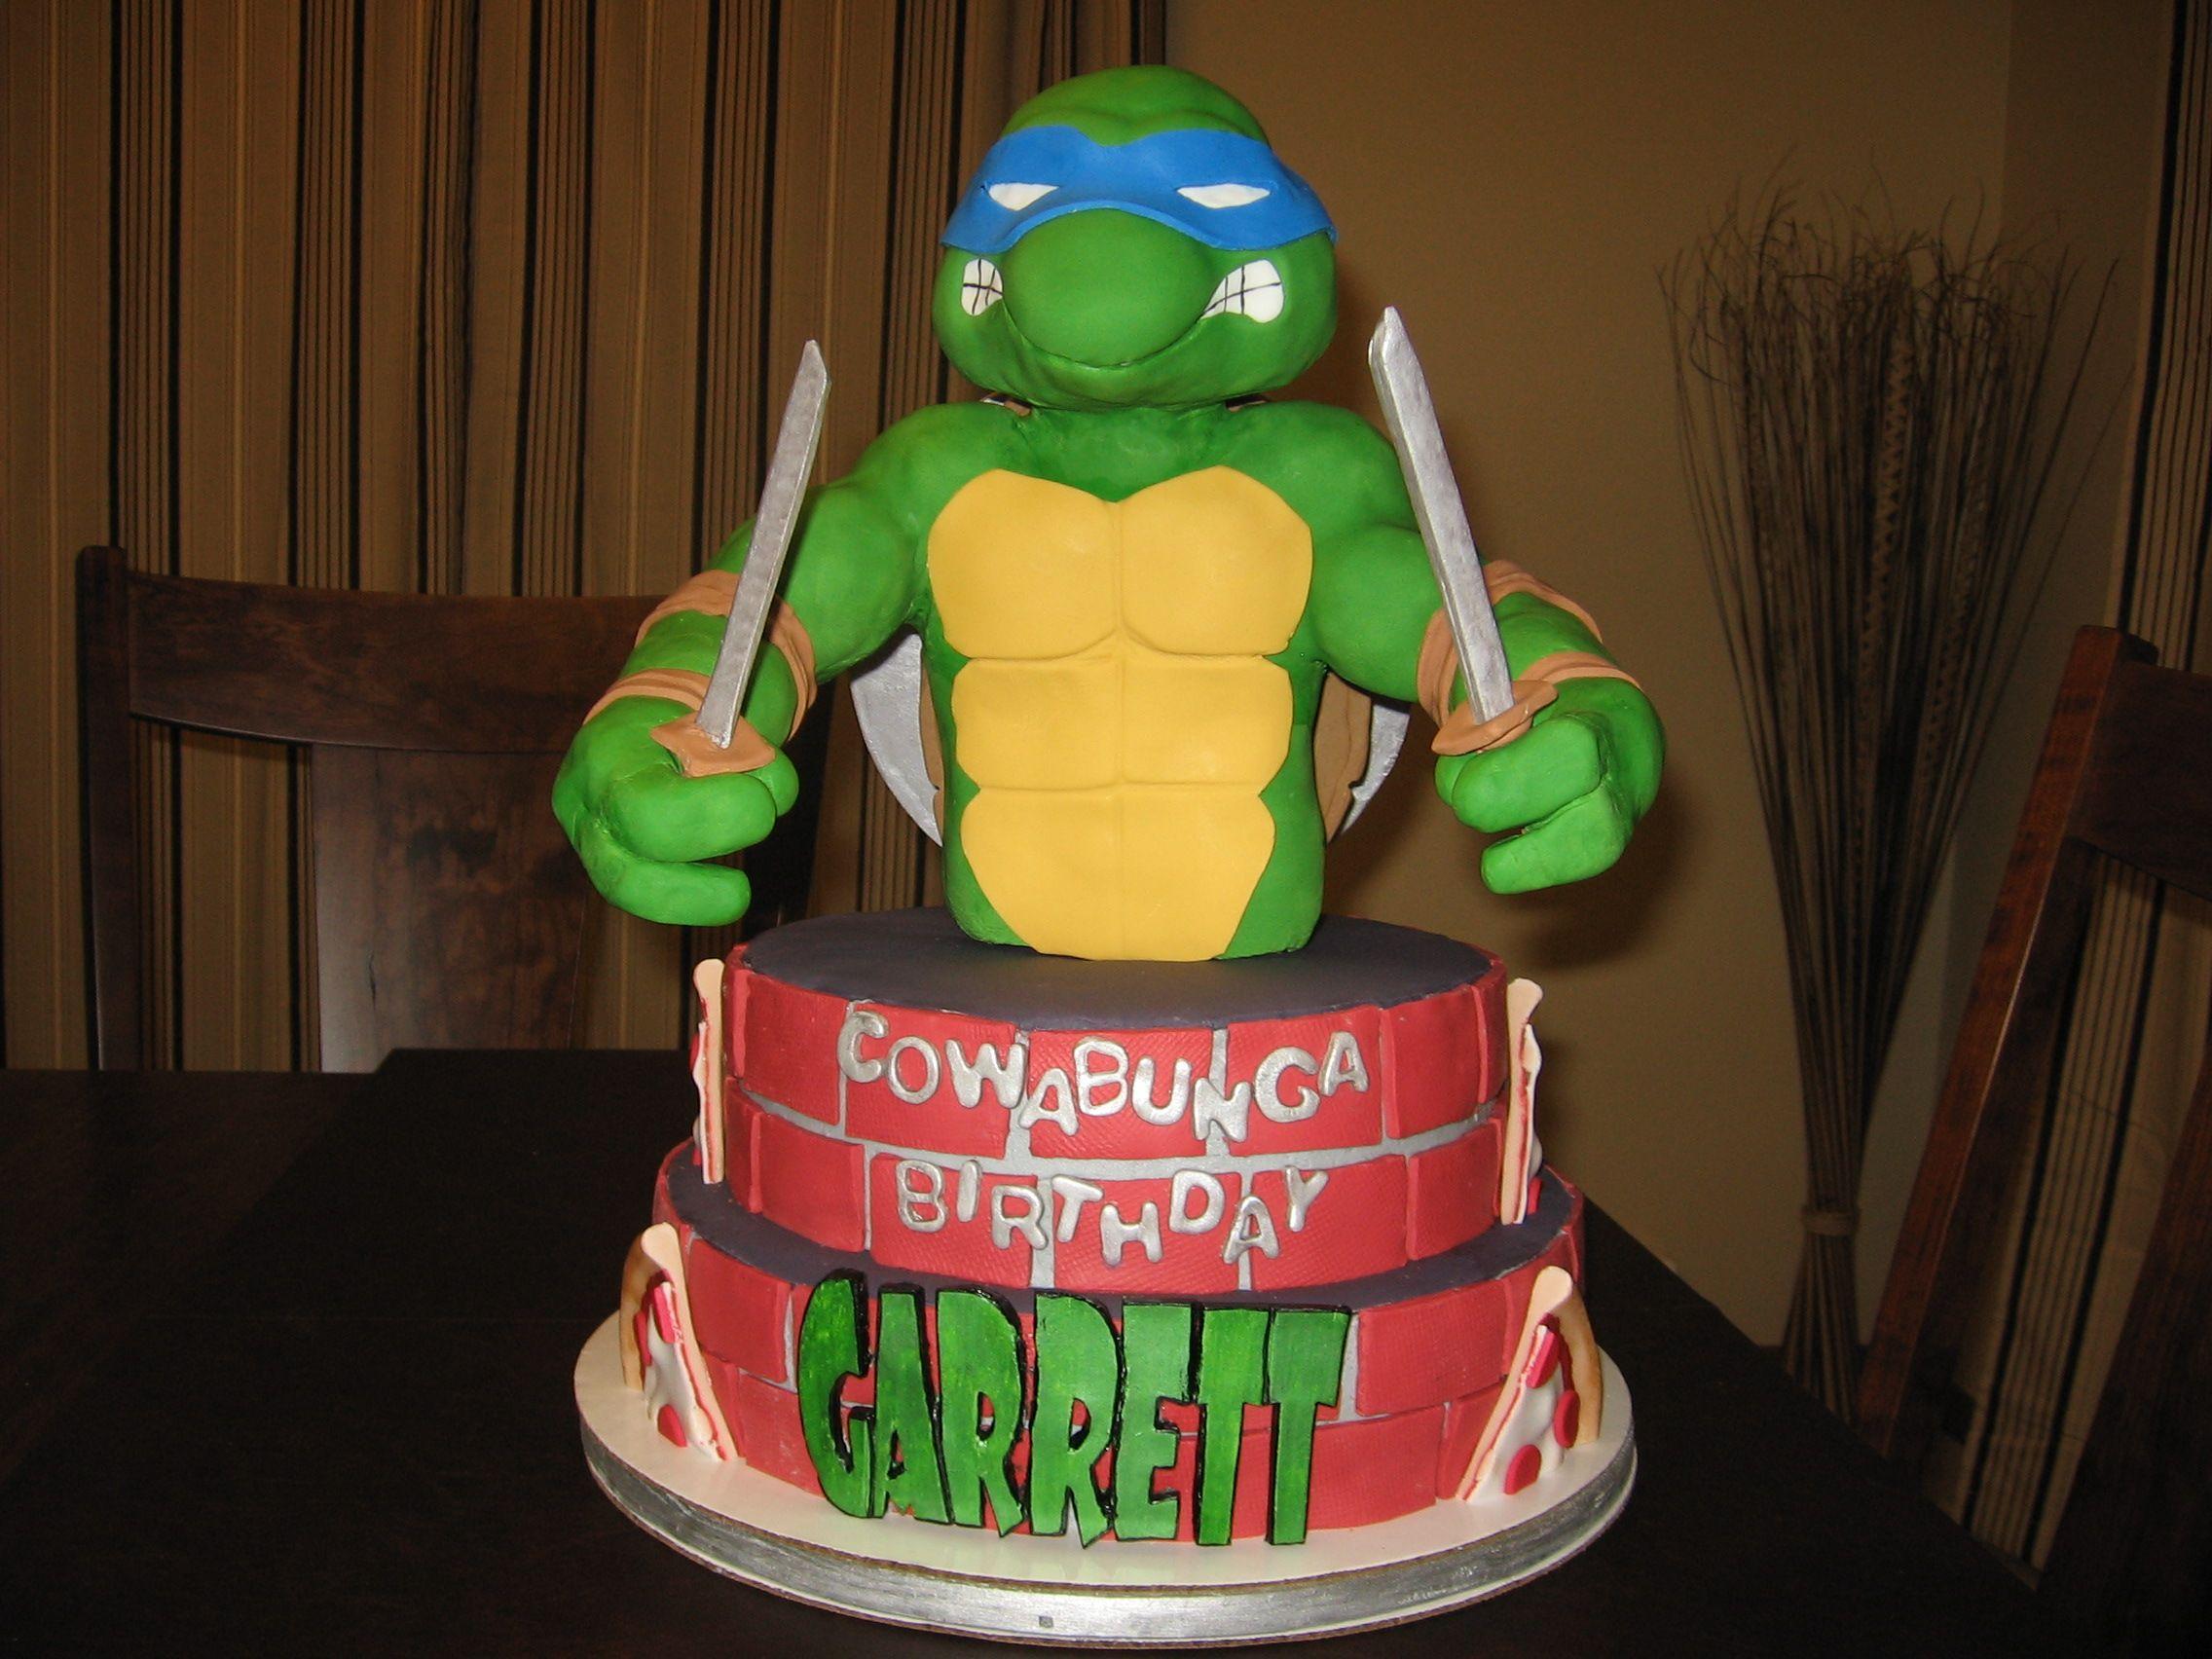 Teenage Mutant Ninja Turtle Cake Tv Movies Celebrity Ninja Turtle Cake Teenage Mutant Ninja Turtle Cake Boy Birthday Cake